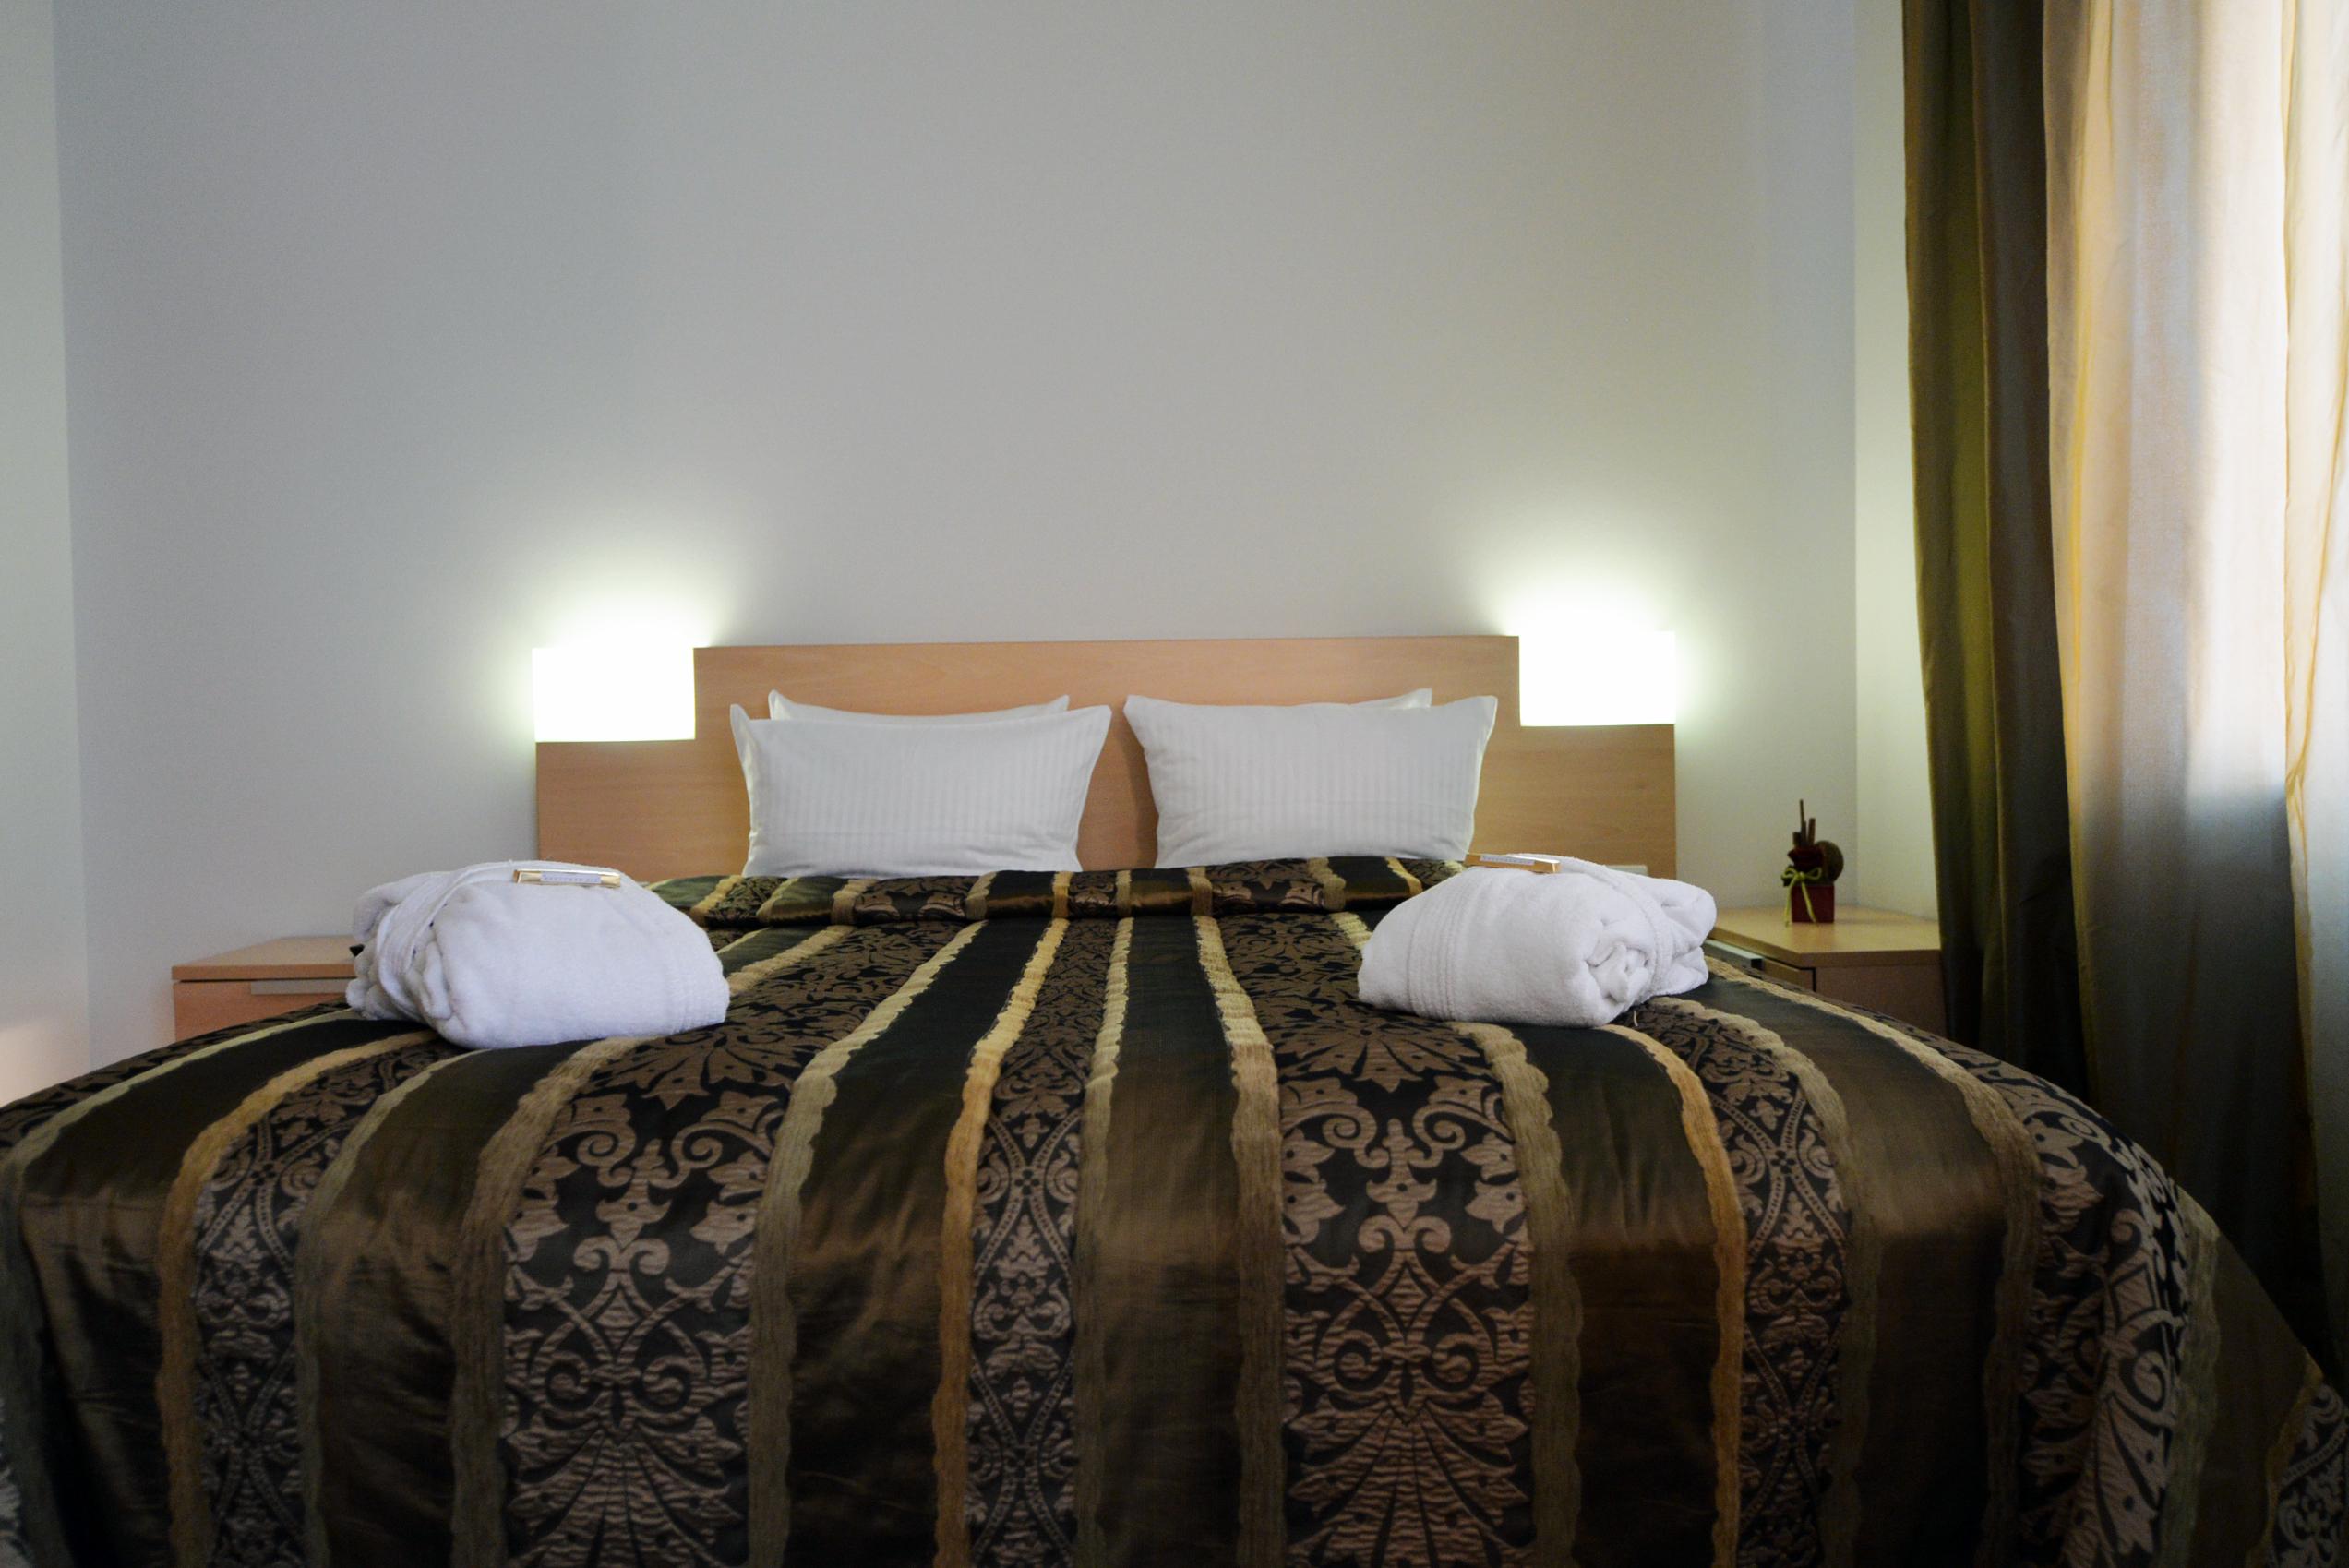 Kambariai, viešbutis NAVALIS, Klaipėda